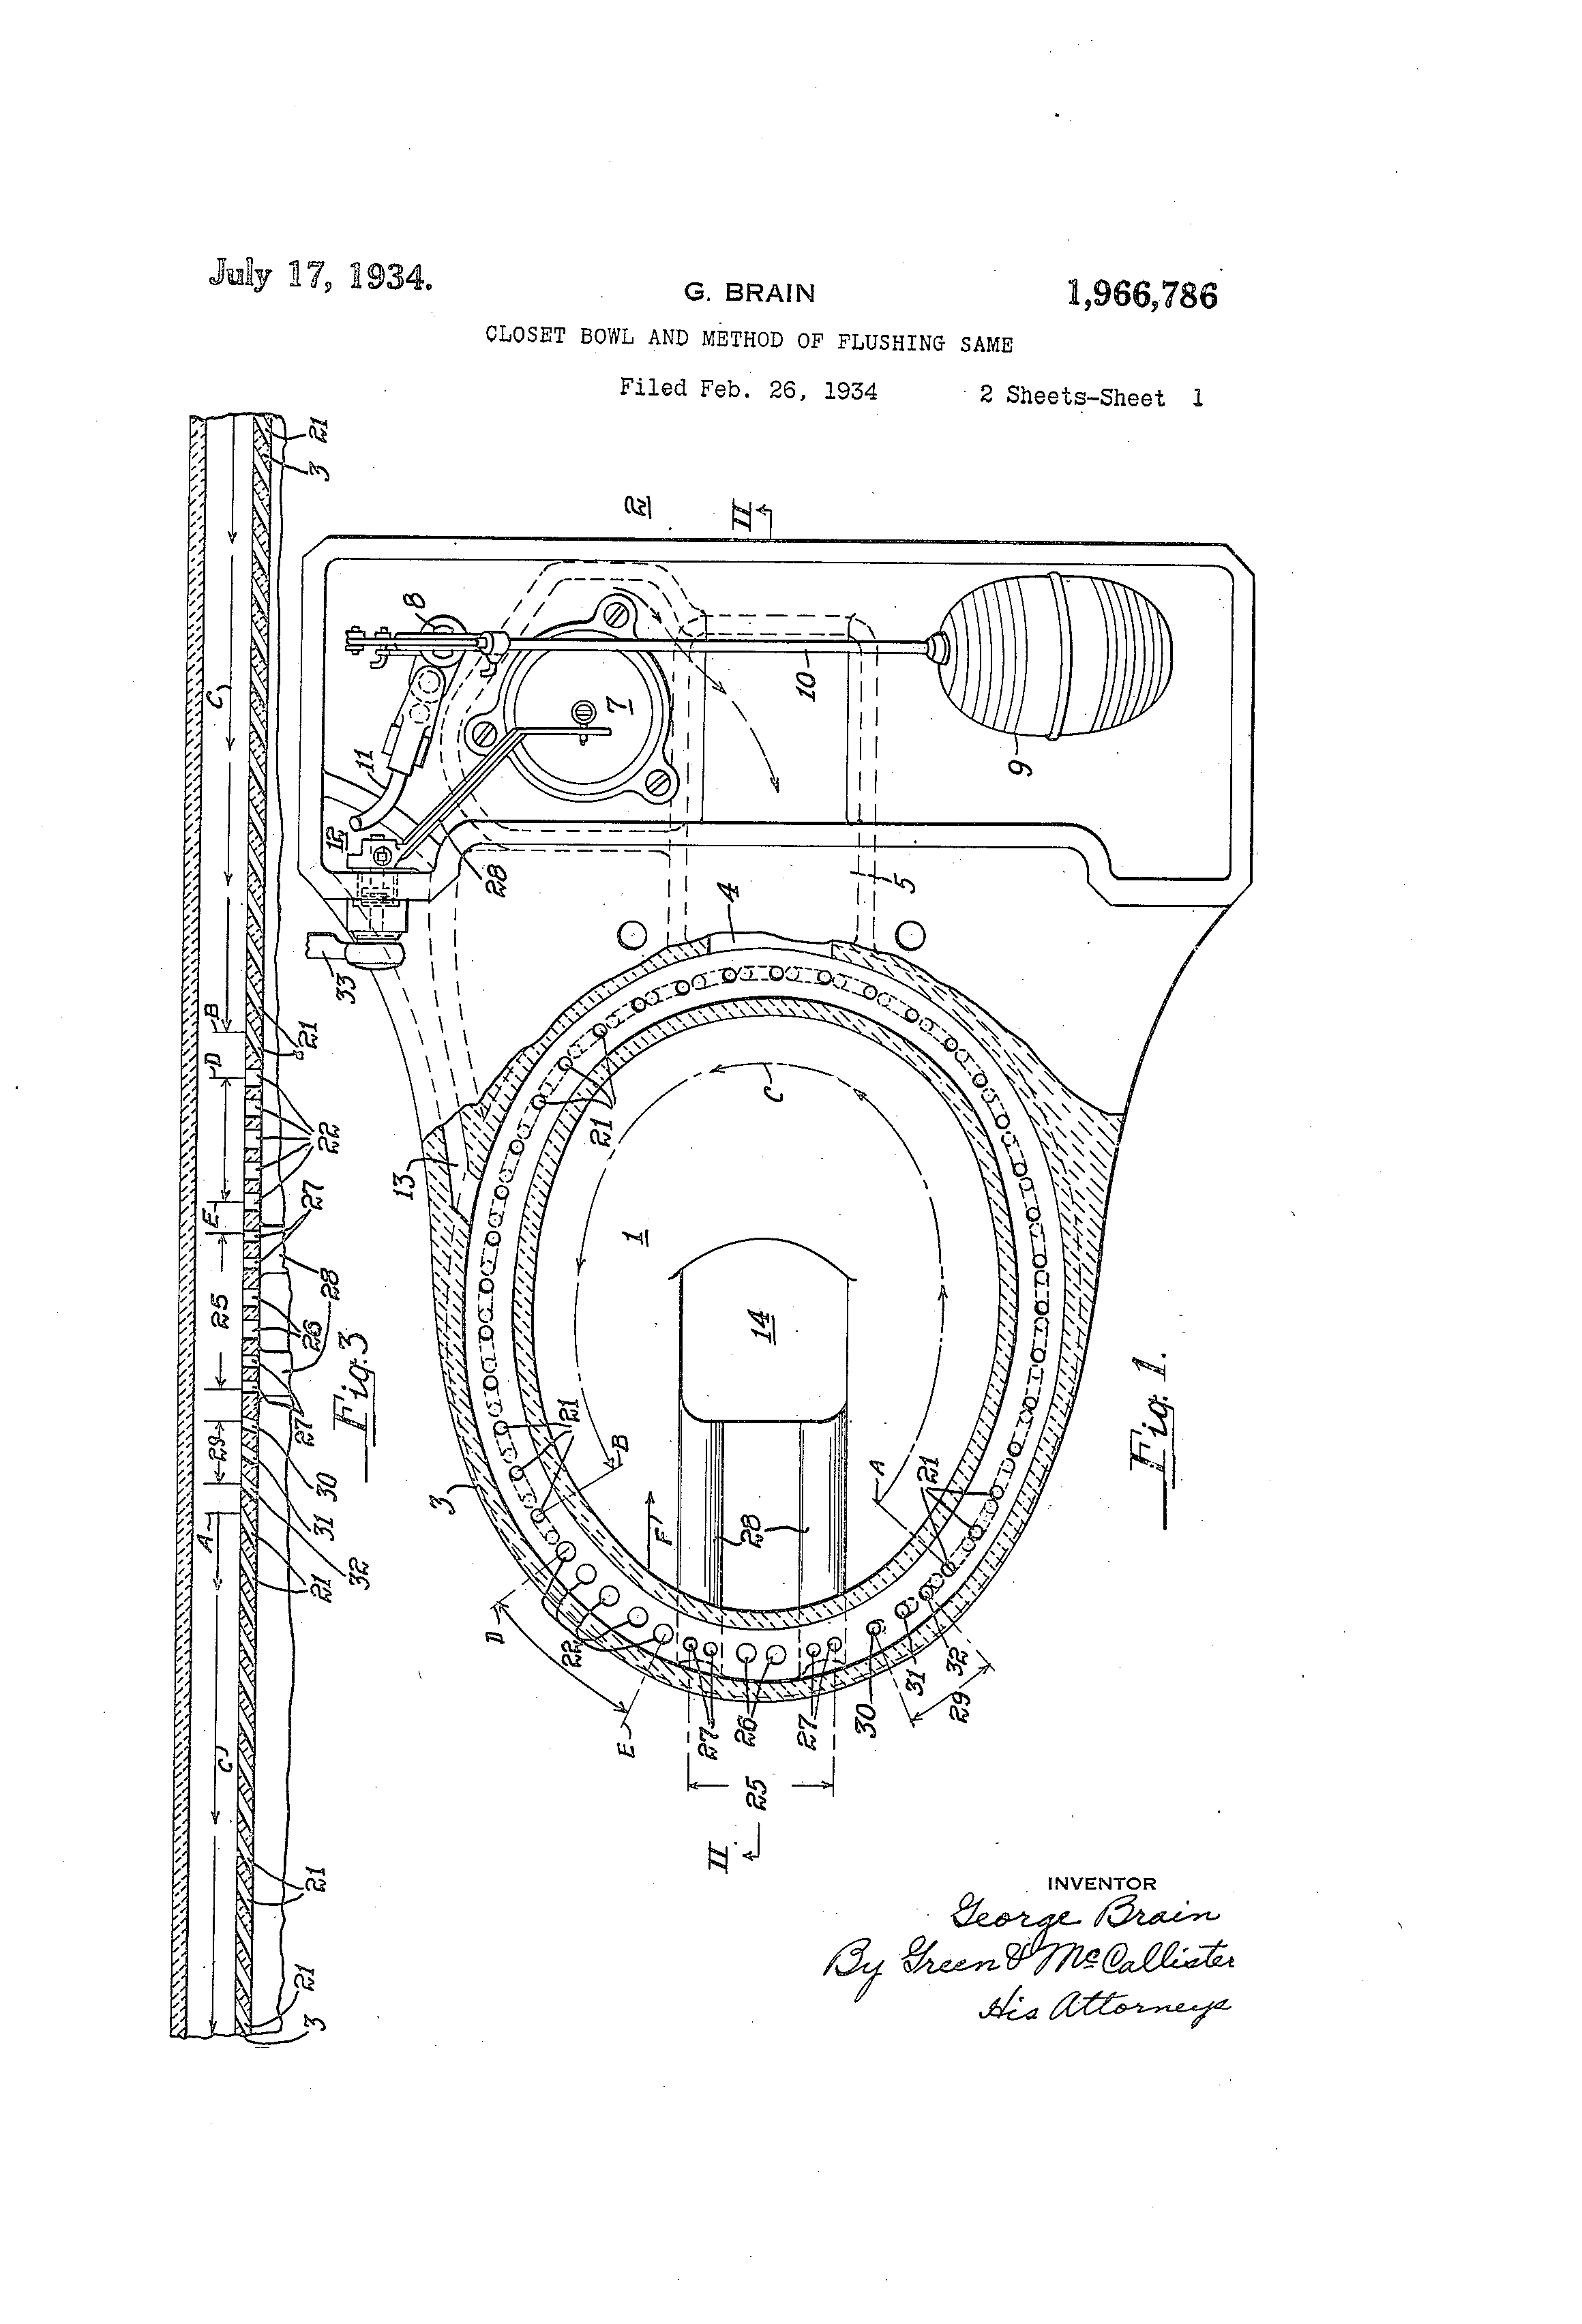 Vintage Patent Drawing